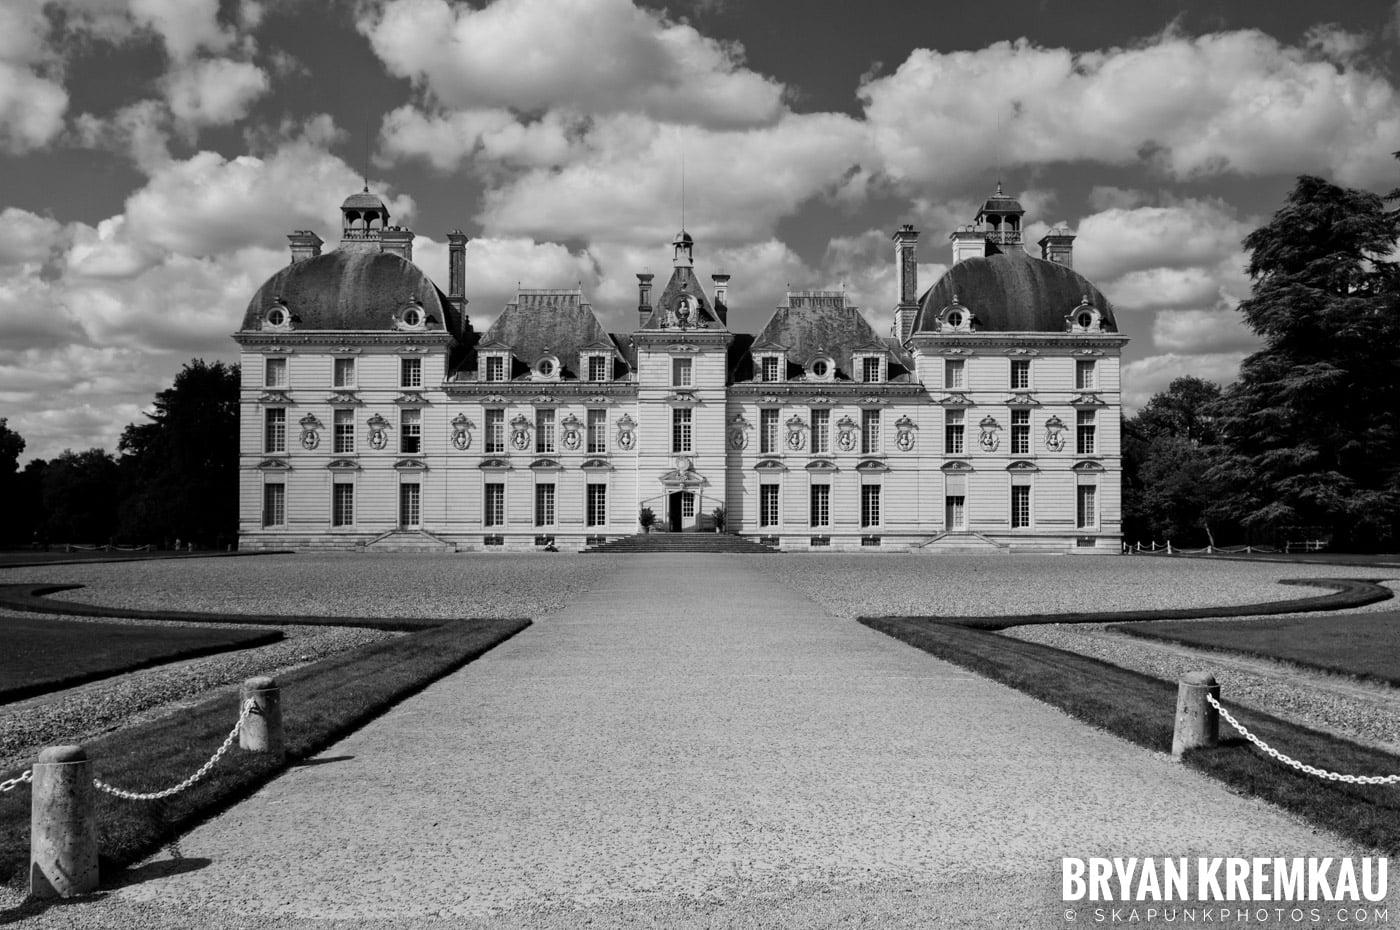 Paris, France Honeymoon - Day 7 - 7.24.11 (3)